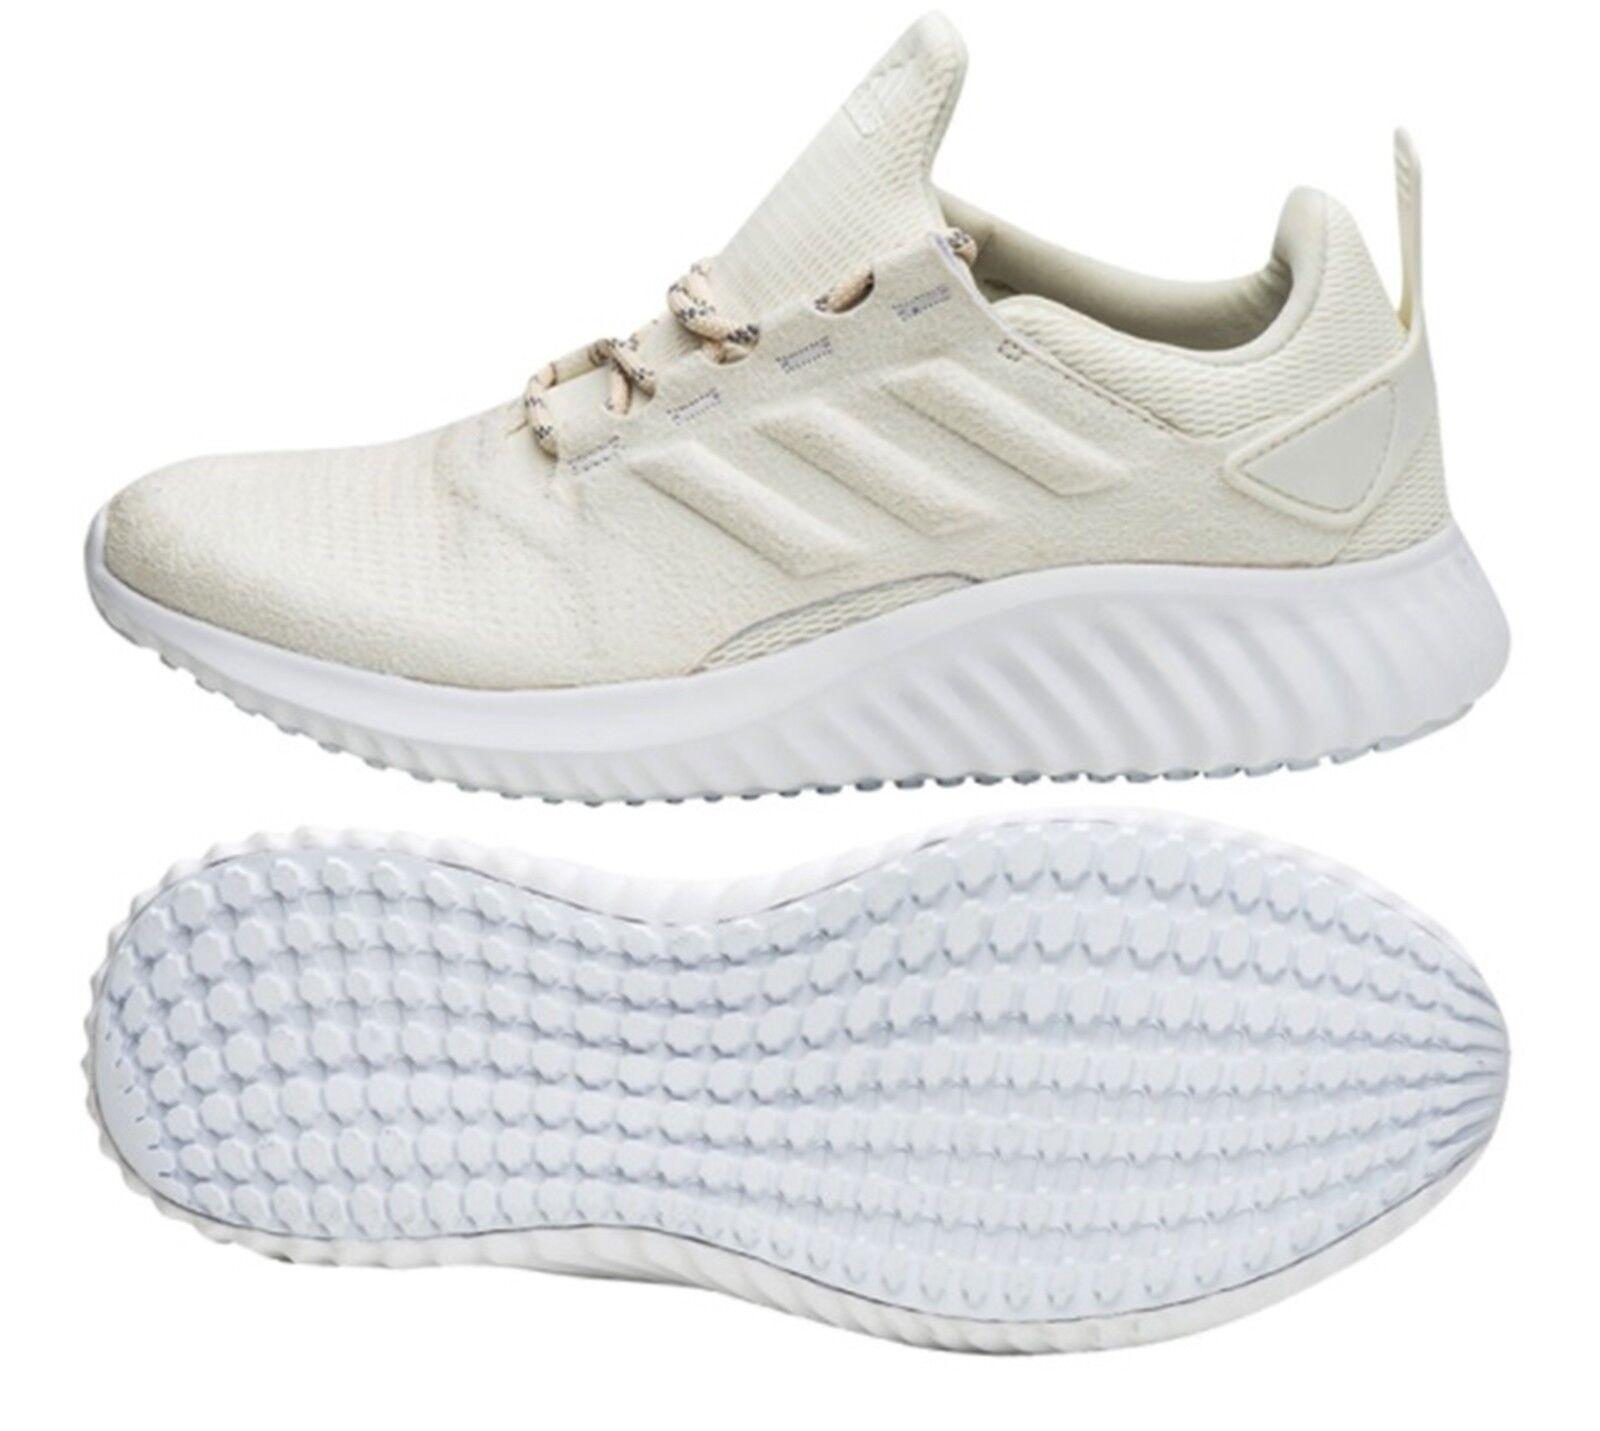 Adidas Sie Alpha Bounce CR Trainingsschuhe Laufende Beige Turnschuhe Schuhe DB1677